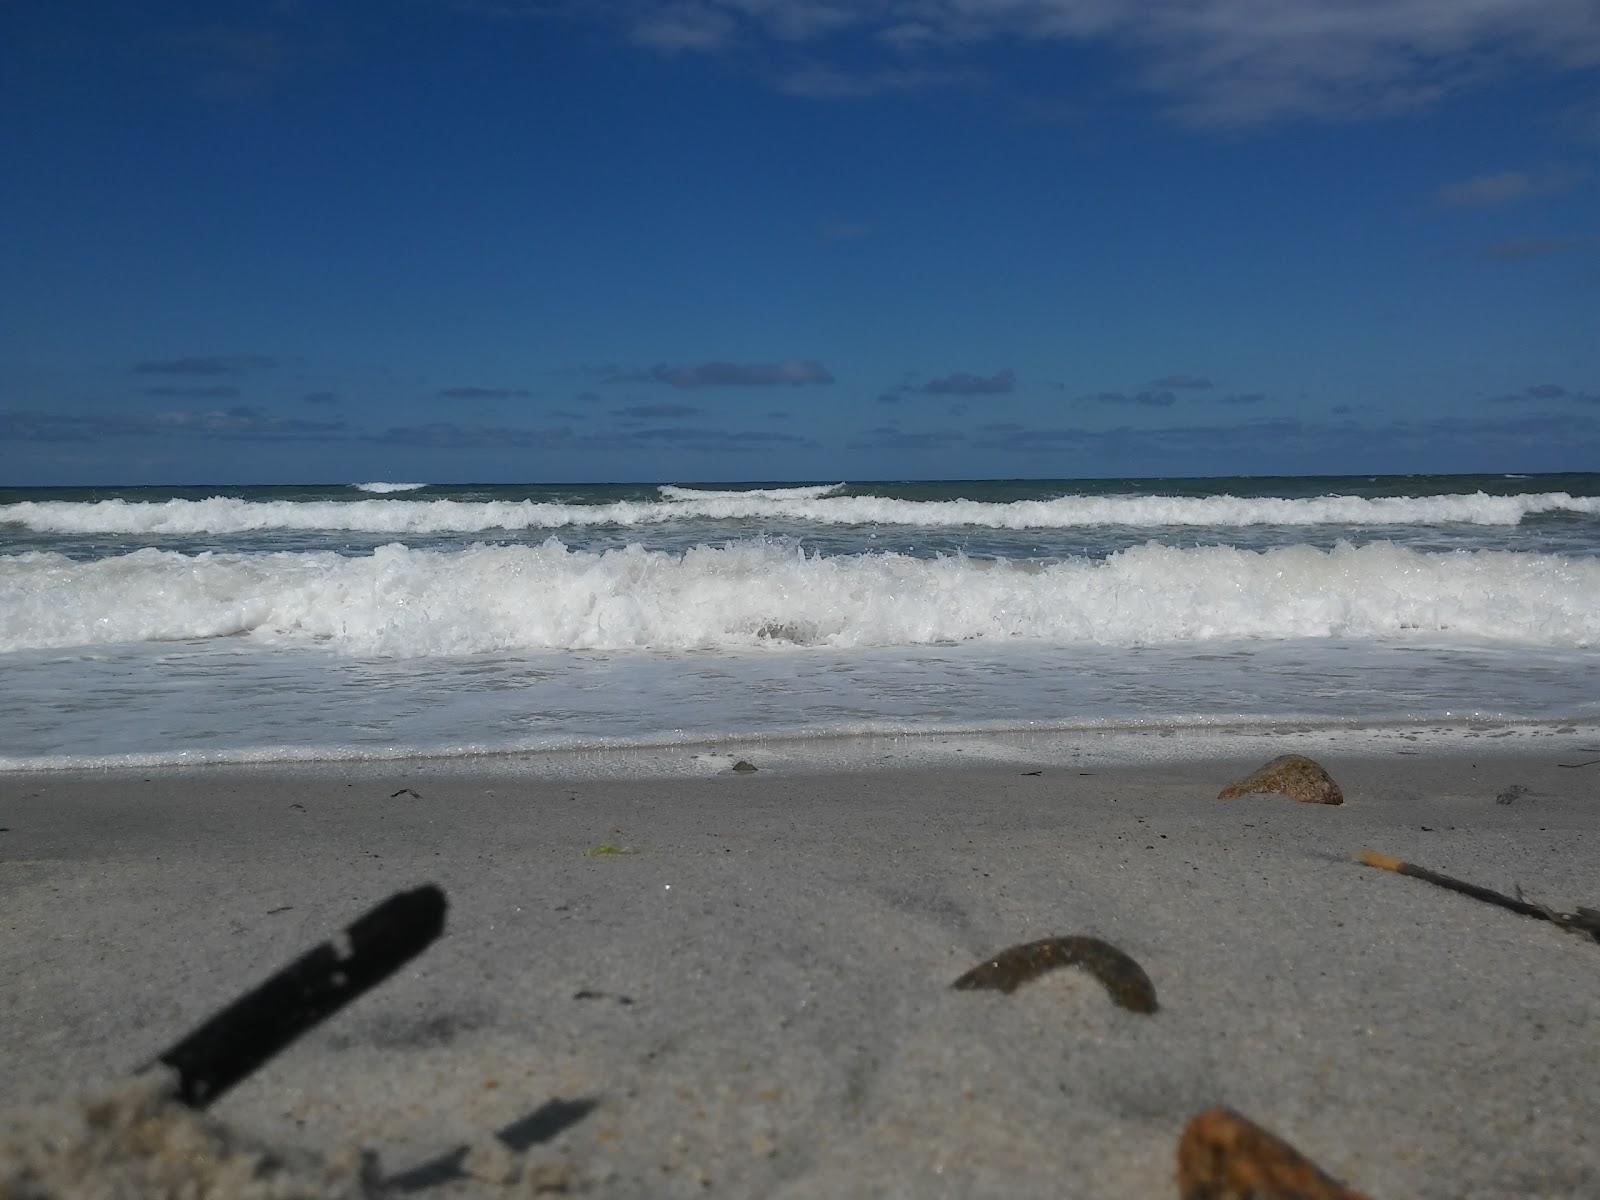 Vacation Home Rentals in Mayflower Beach